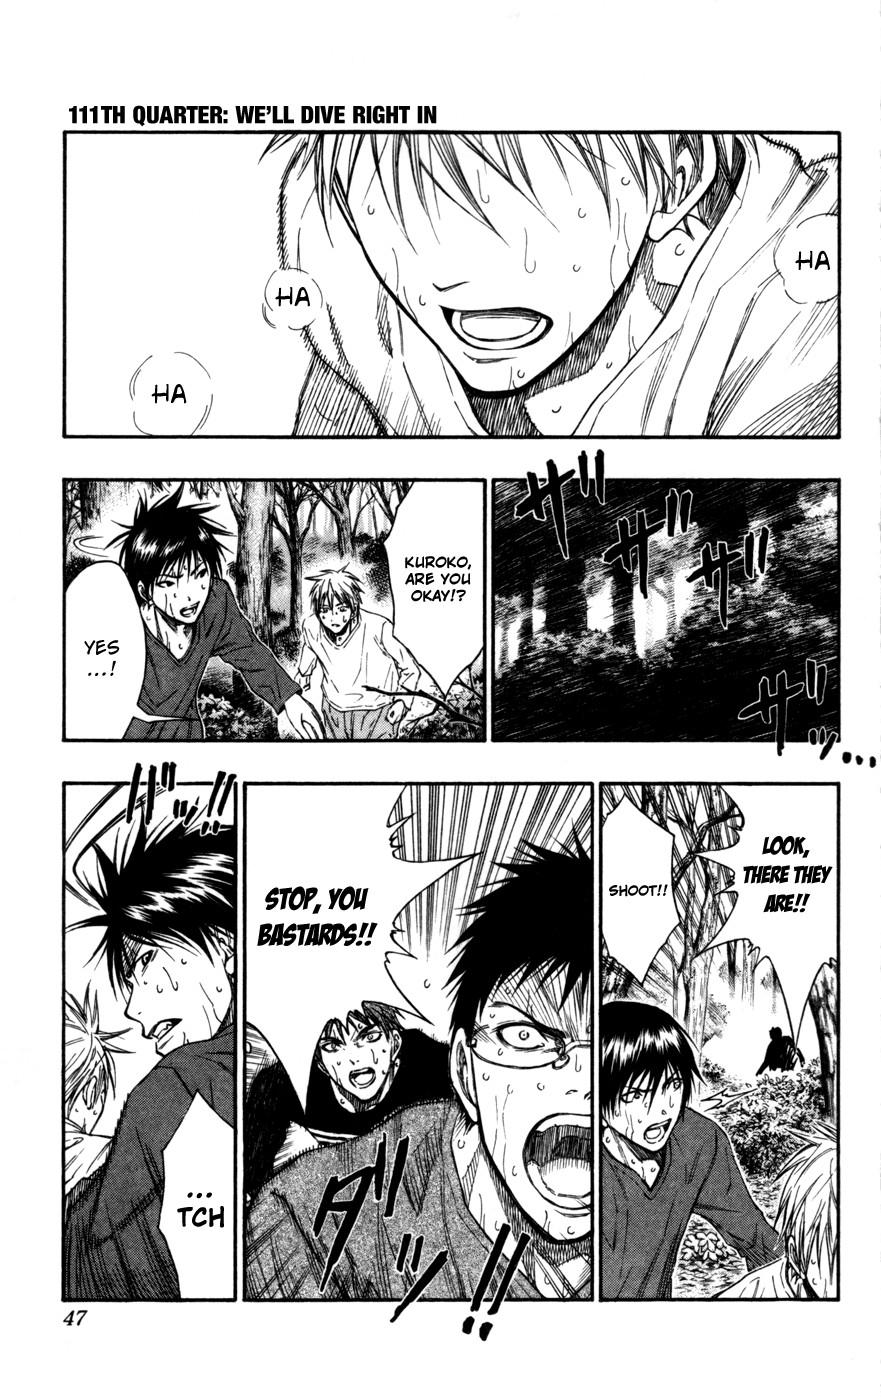 Kuroko no Basket Manga Chapter 111 - Image 01